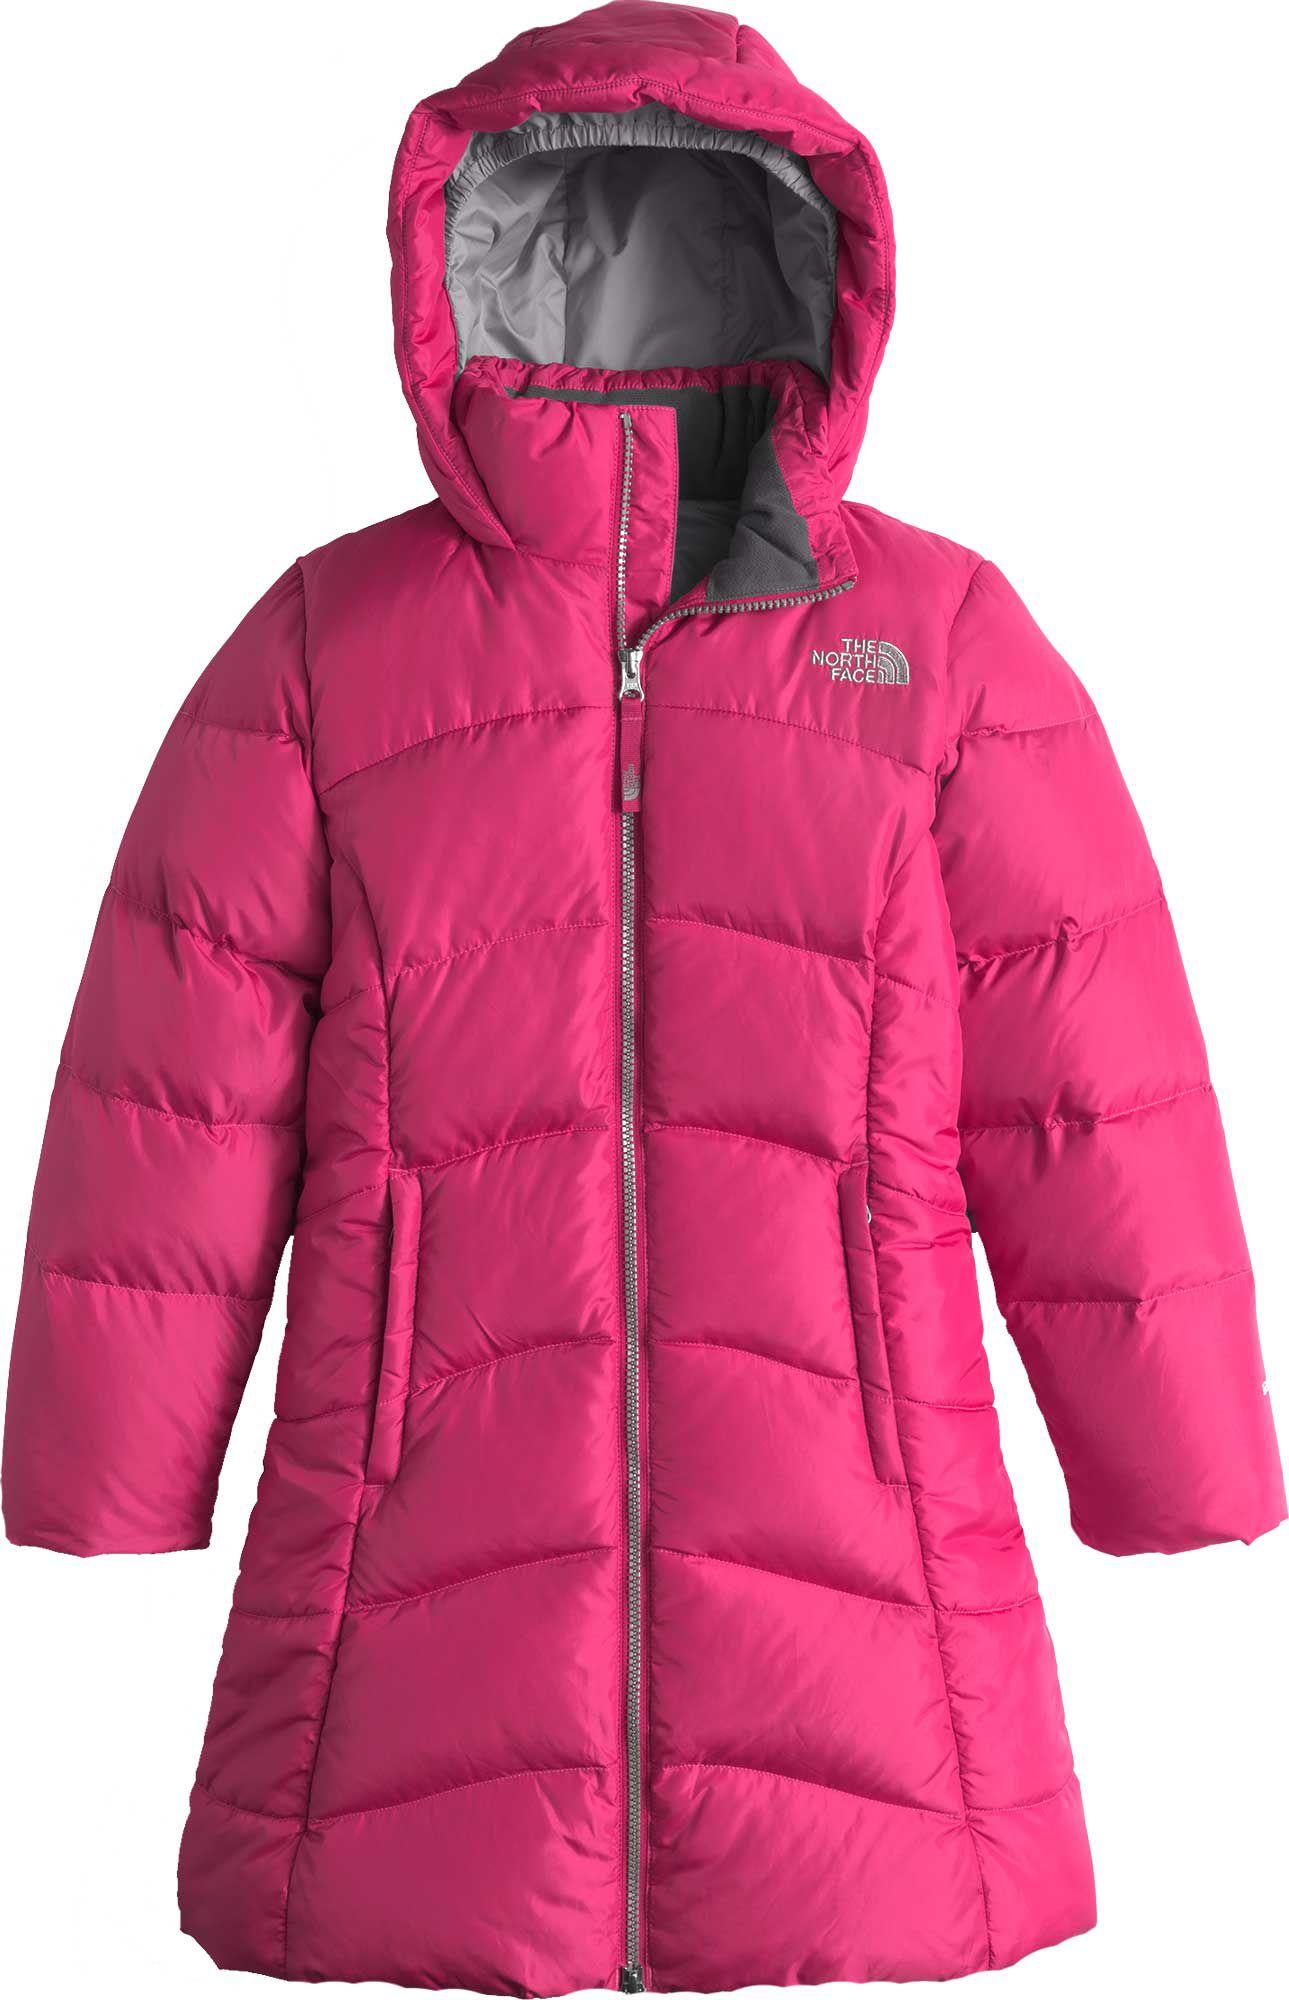 Girls&39 Winter Coats &amp Jackets | DICK&39s Sporting Goods